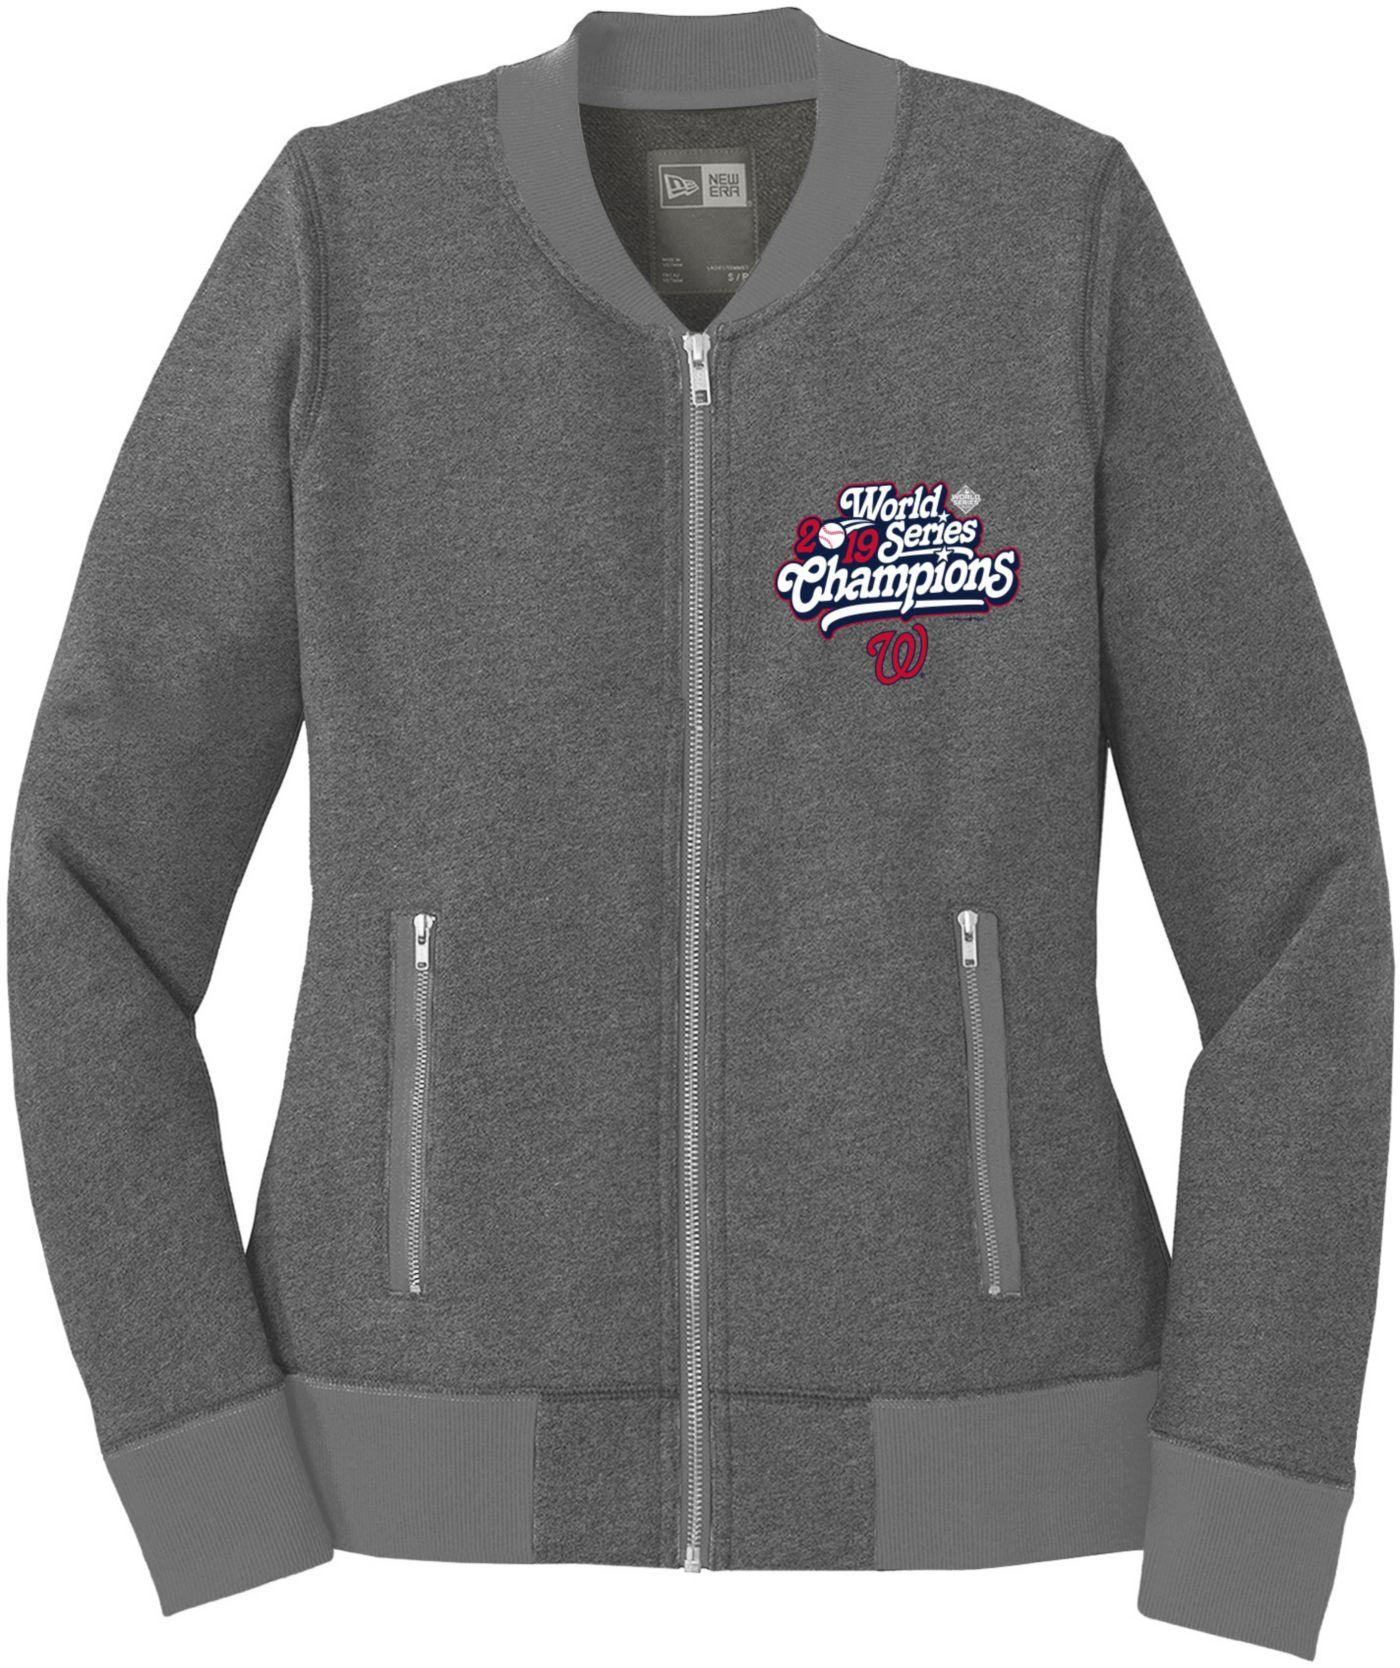 New Era Women's 2019 World Series Champions Washington Nationals Full-Zip Jacket